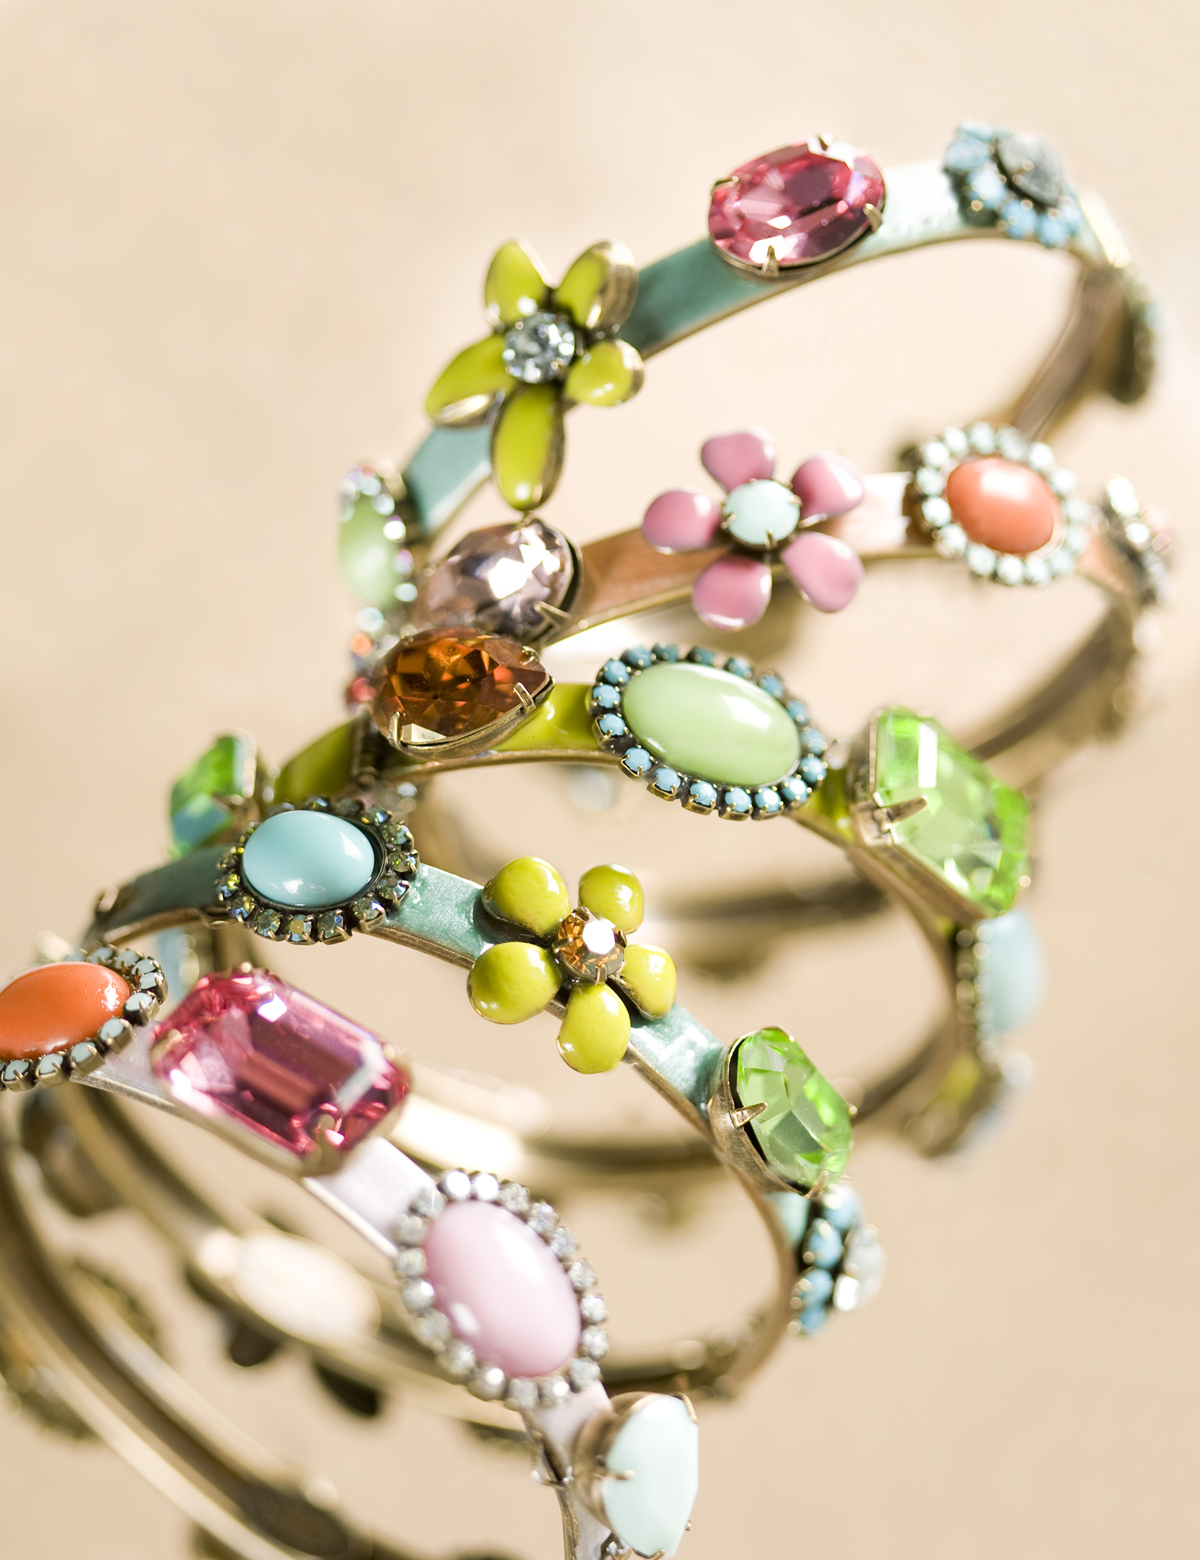 Jewelry_Bracelets.jpg